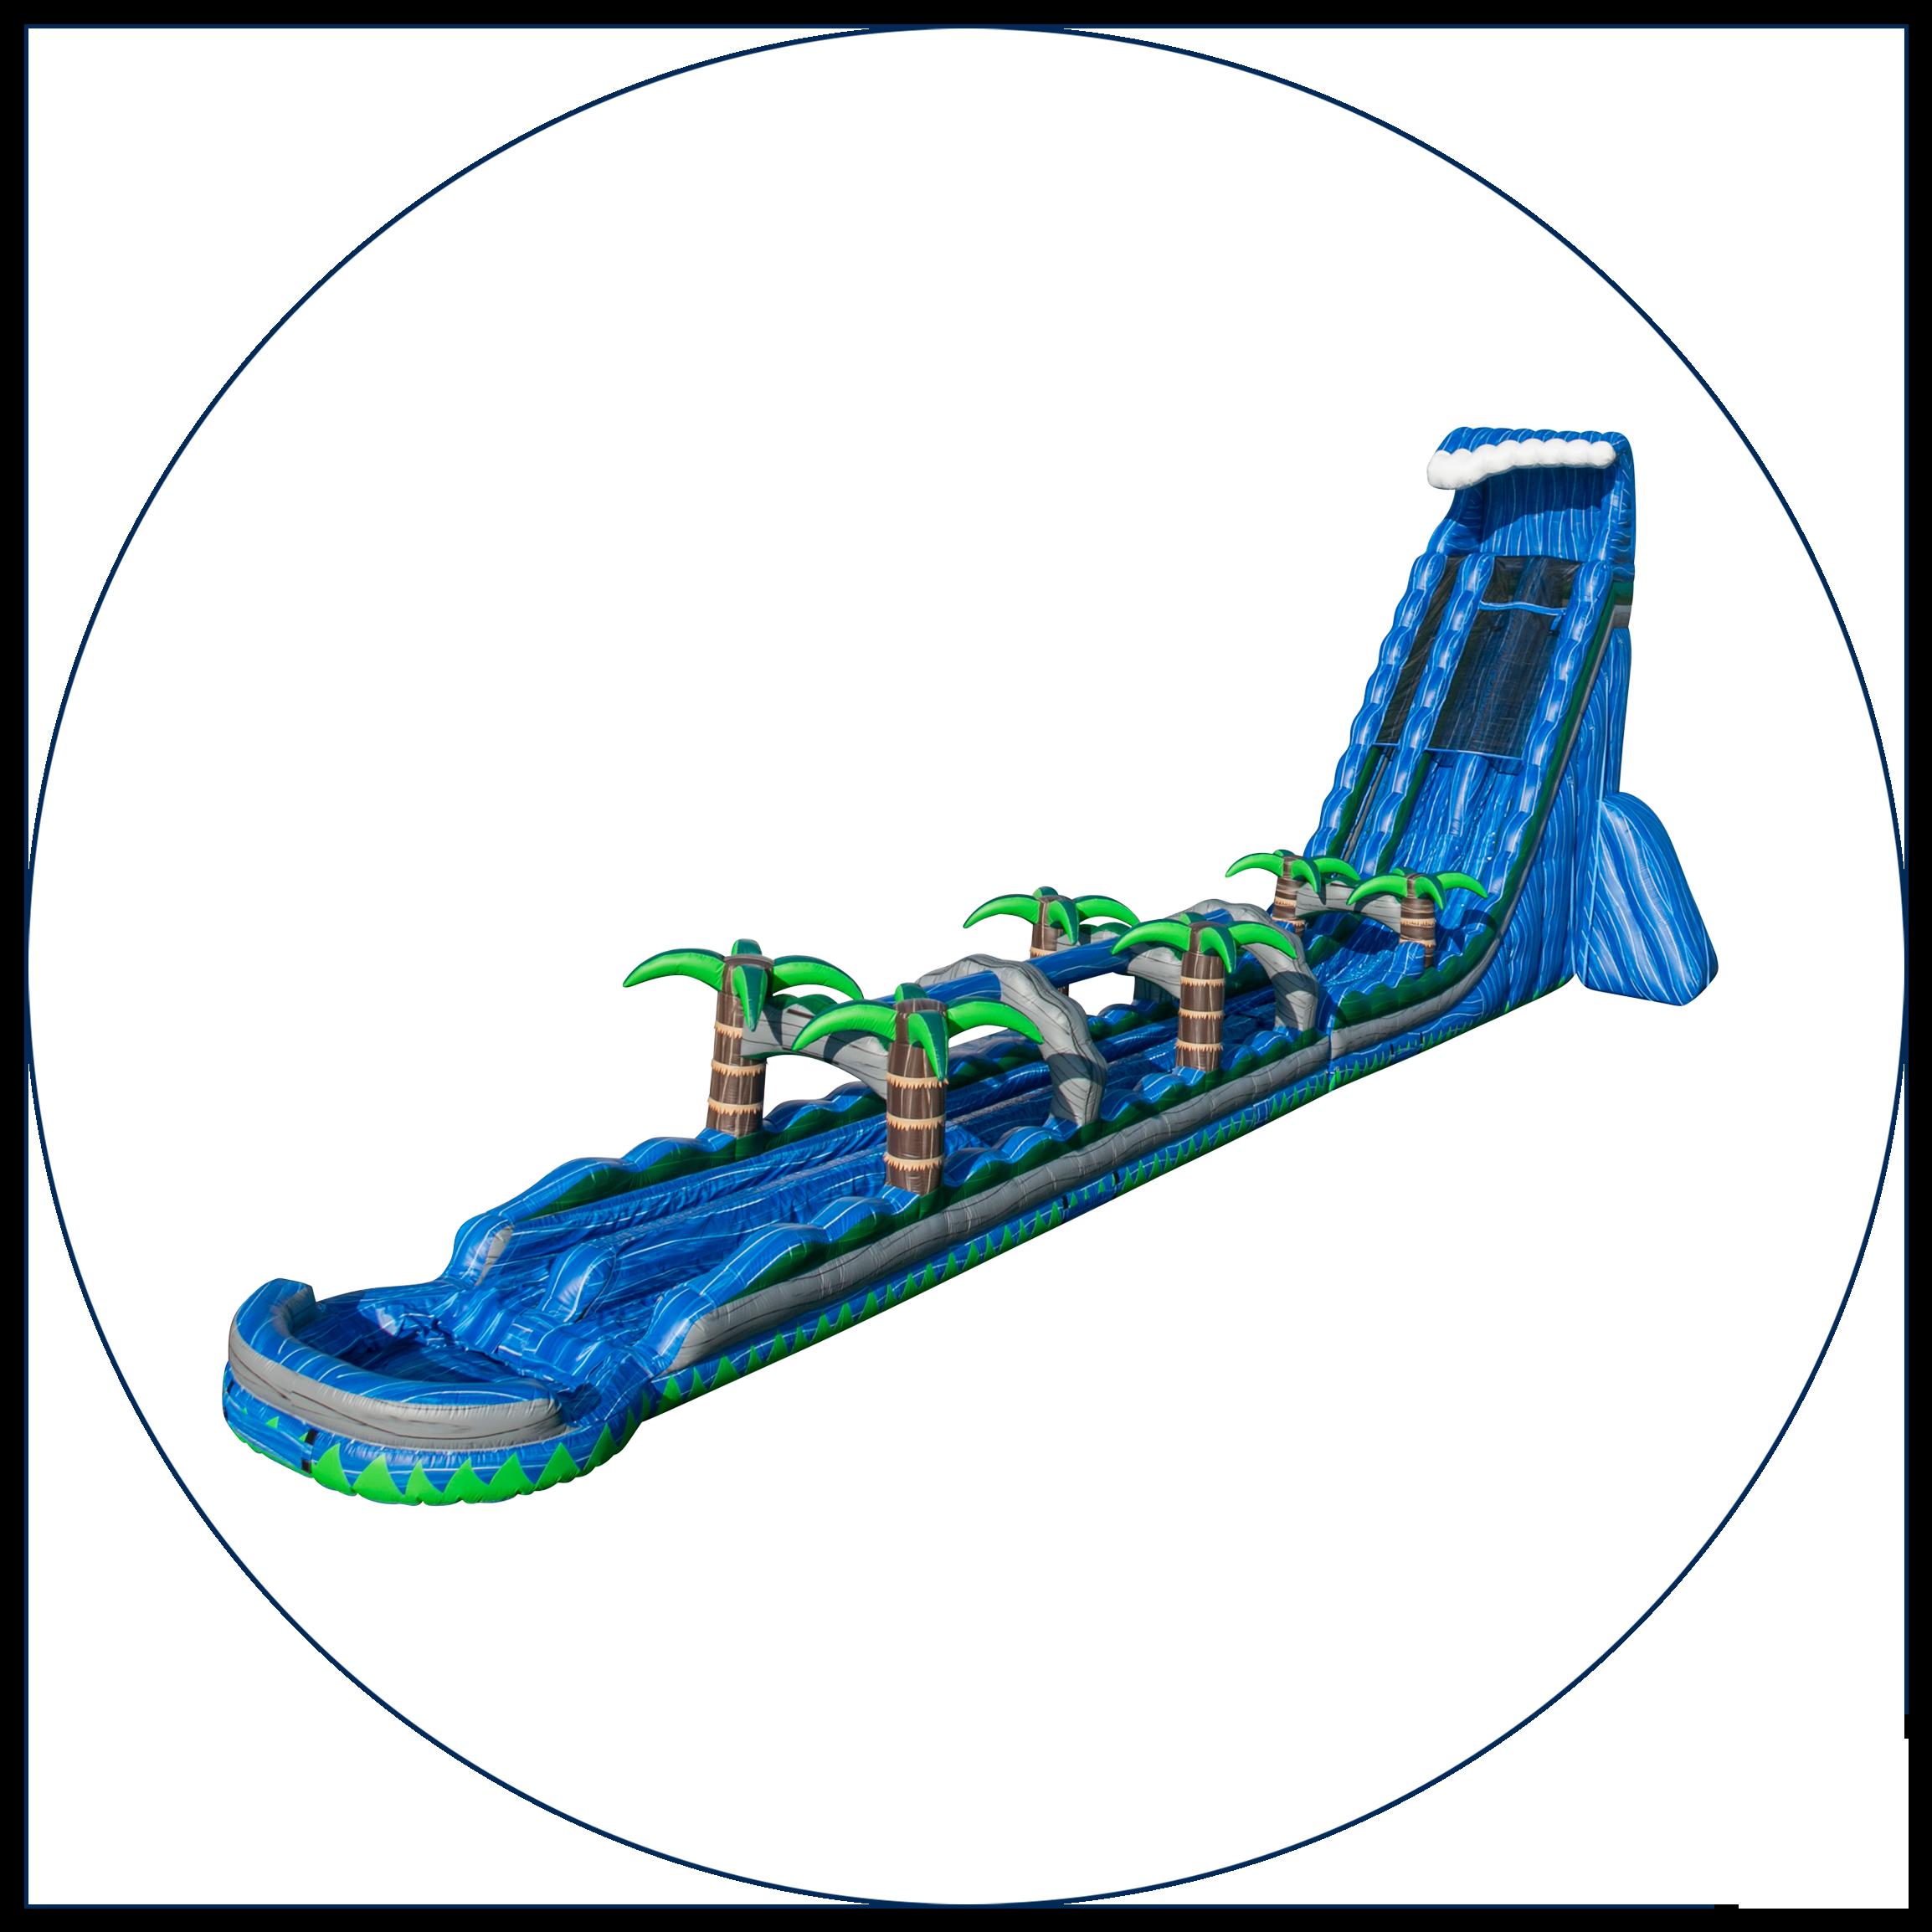 23 - 43 Ft. Water Slides